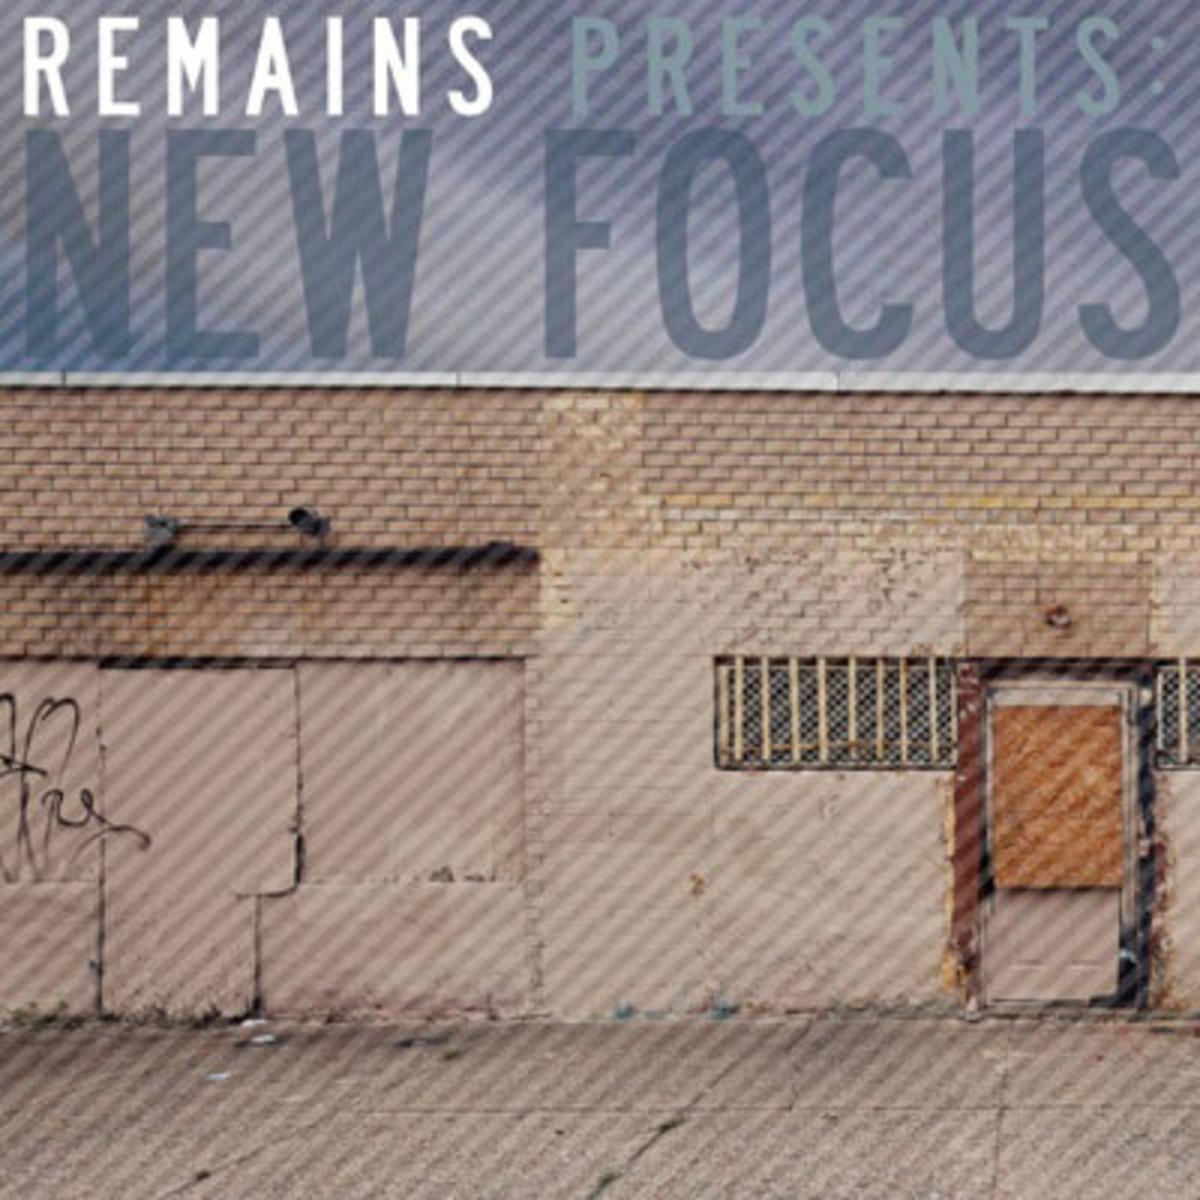 remains-newfocus.jpg